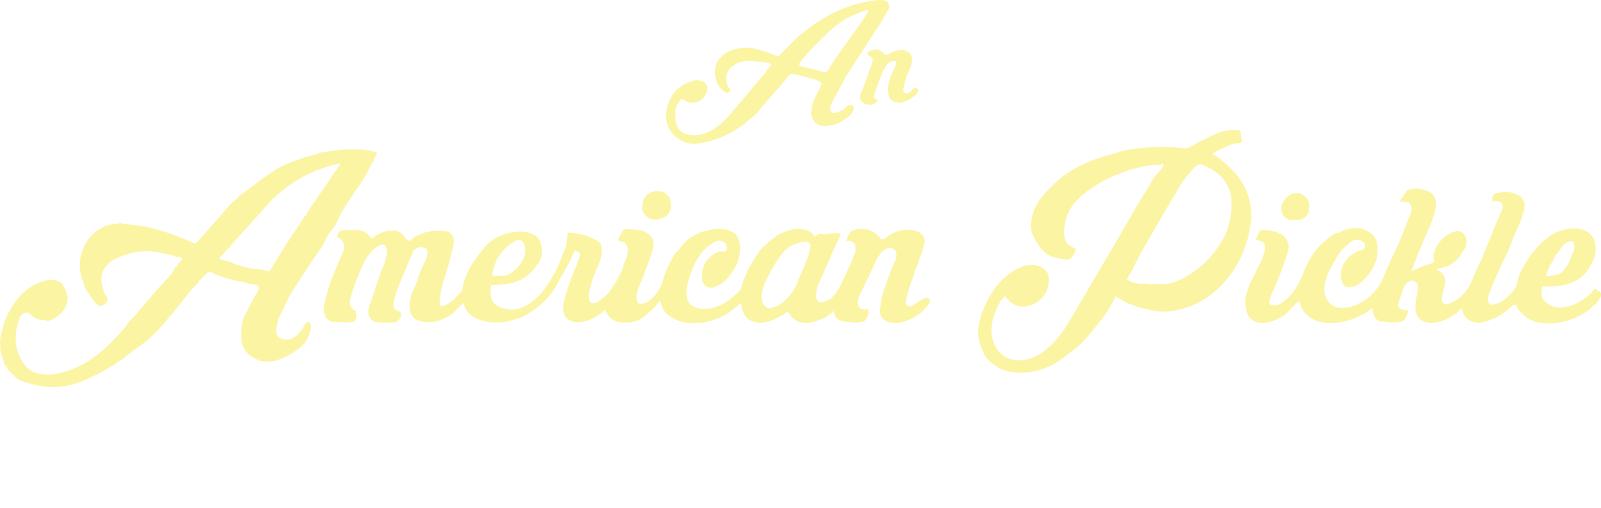 An American Pickle : %$SYNOPSIS% | Warner Bros.